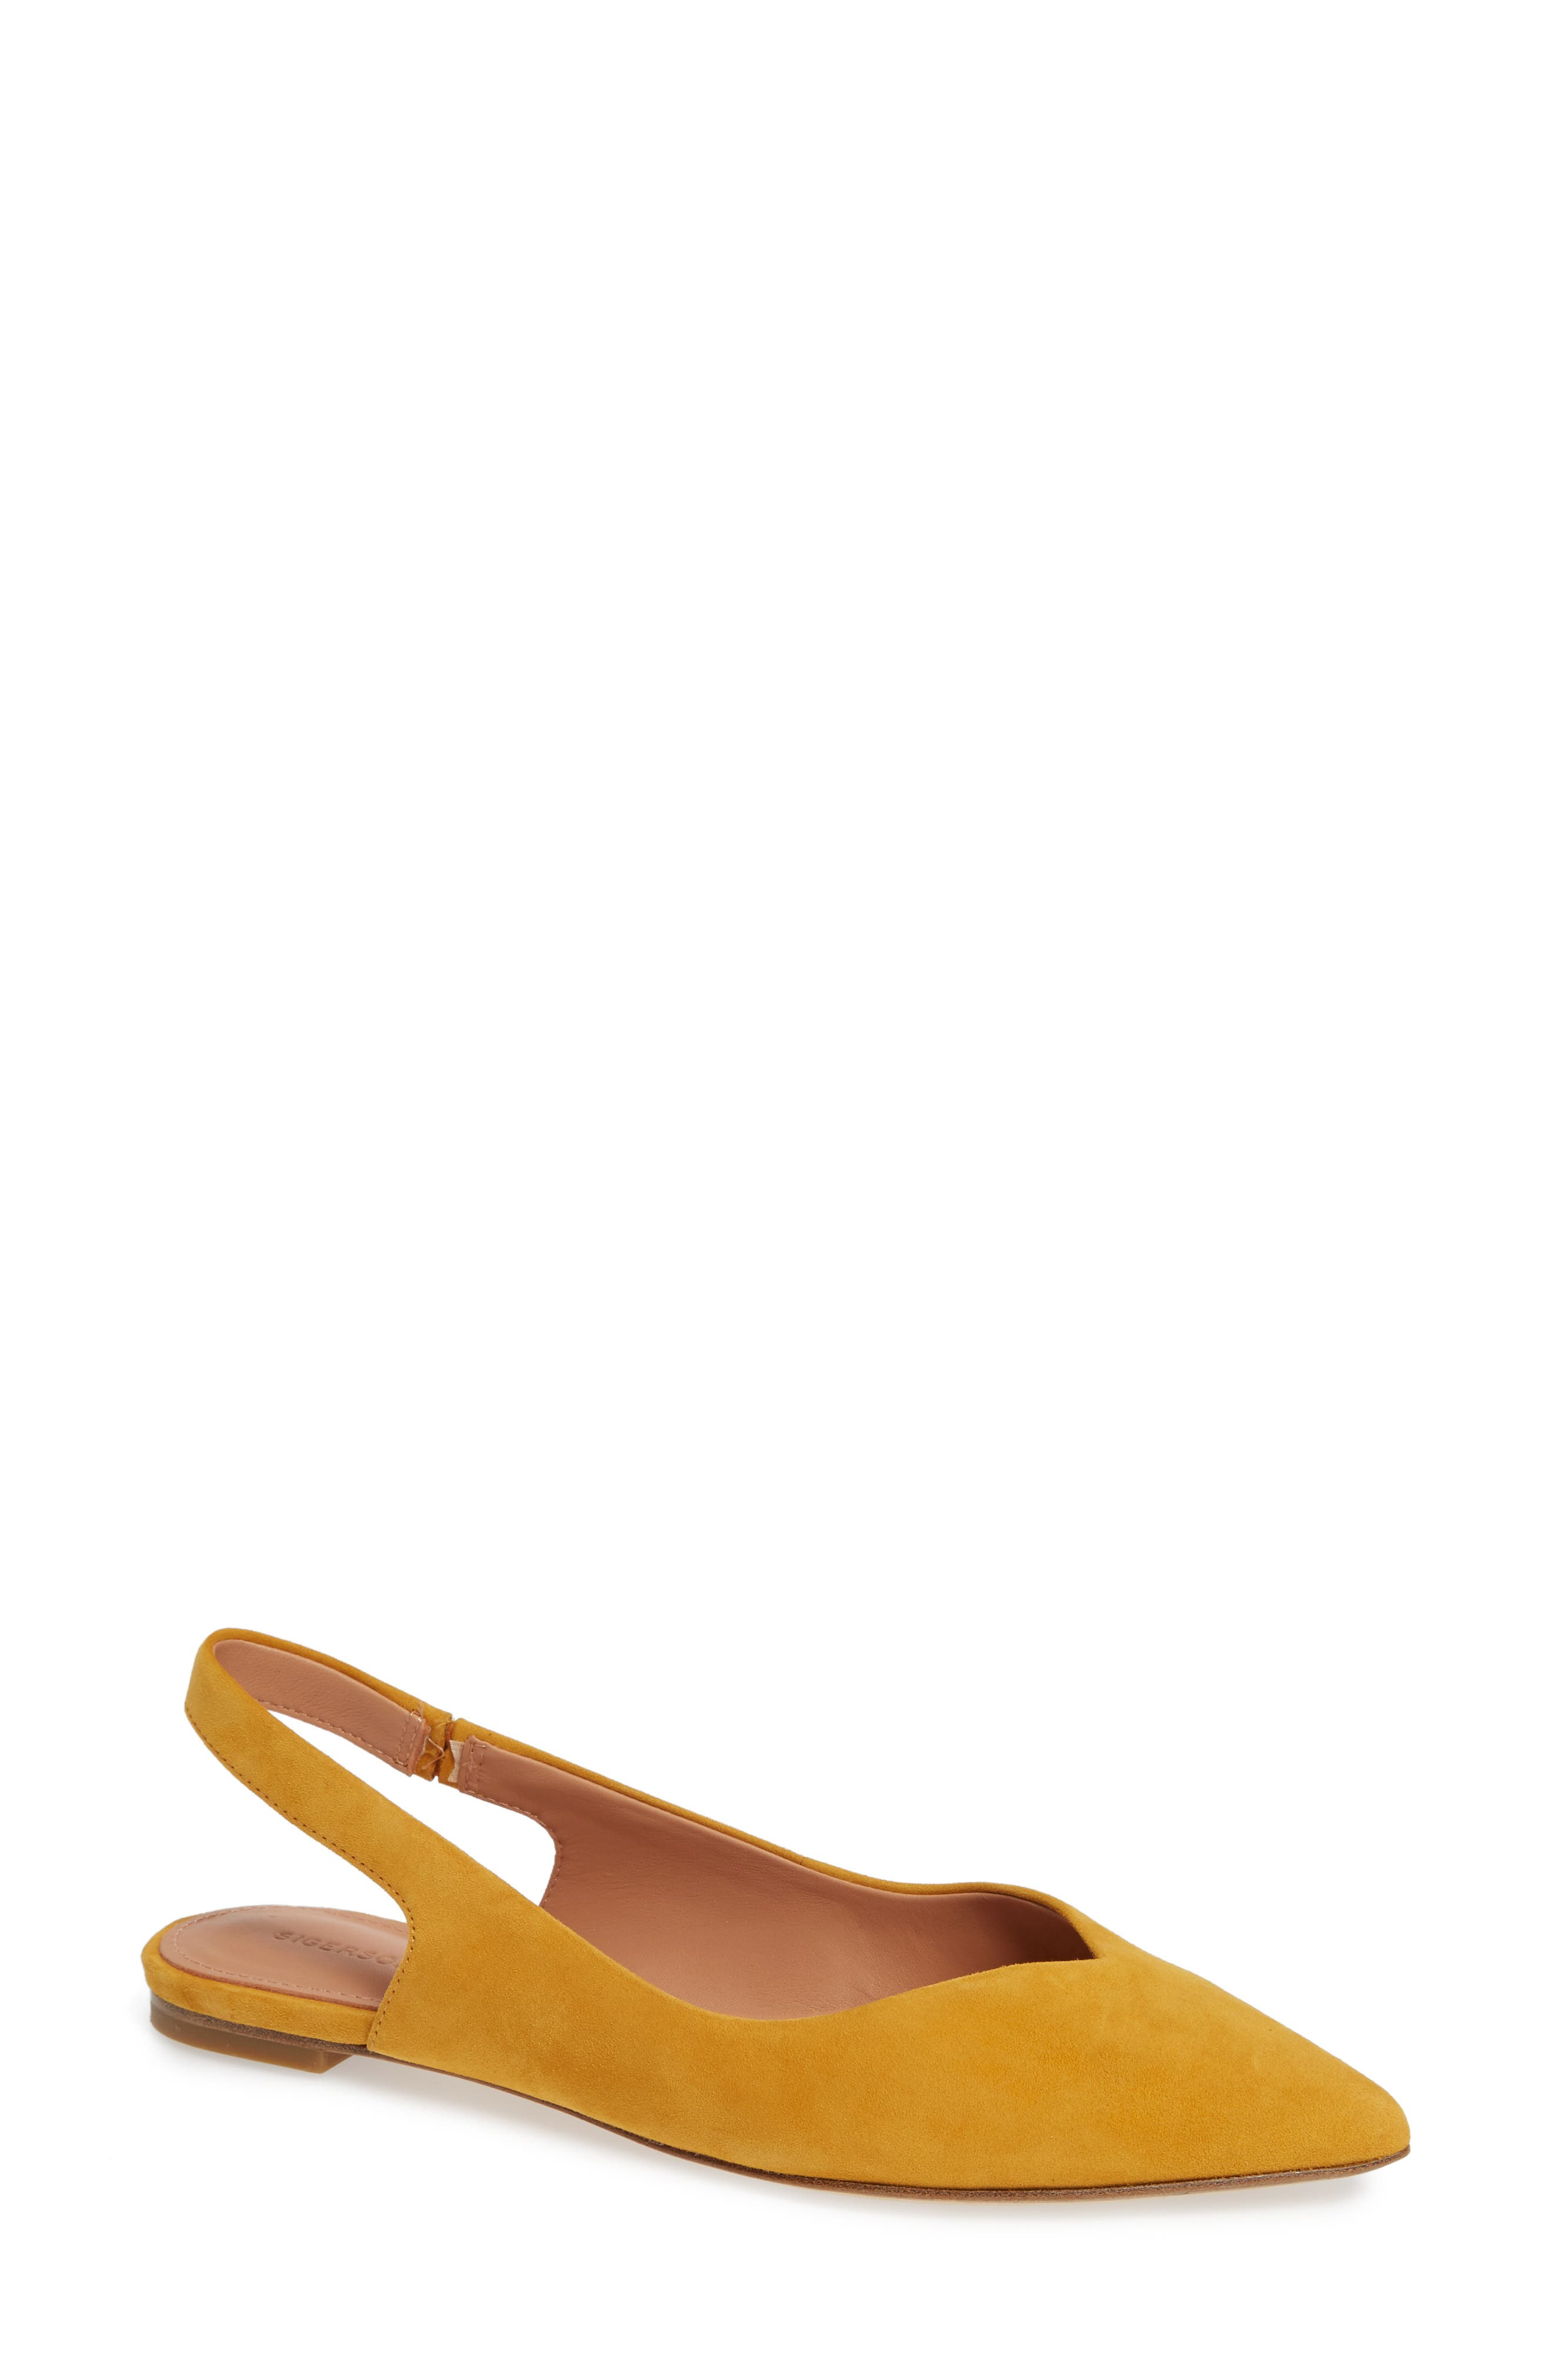 Sigerson Morrison Slingback Flat - Yellow